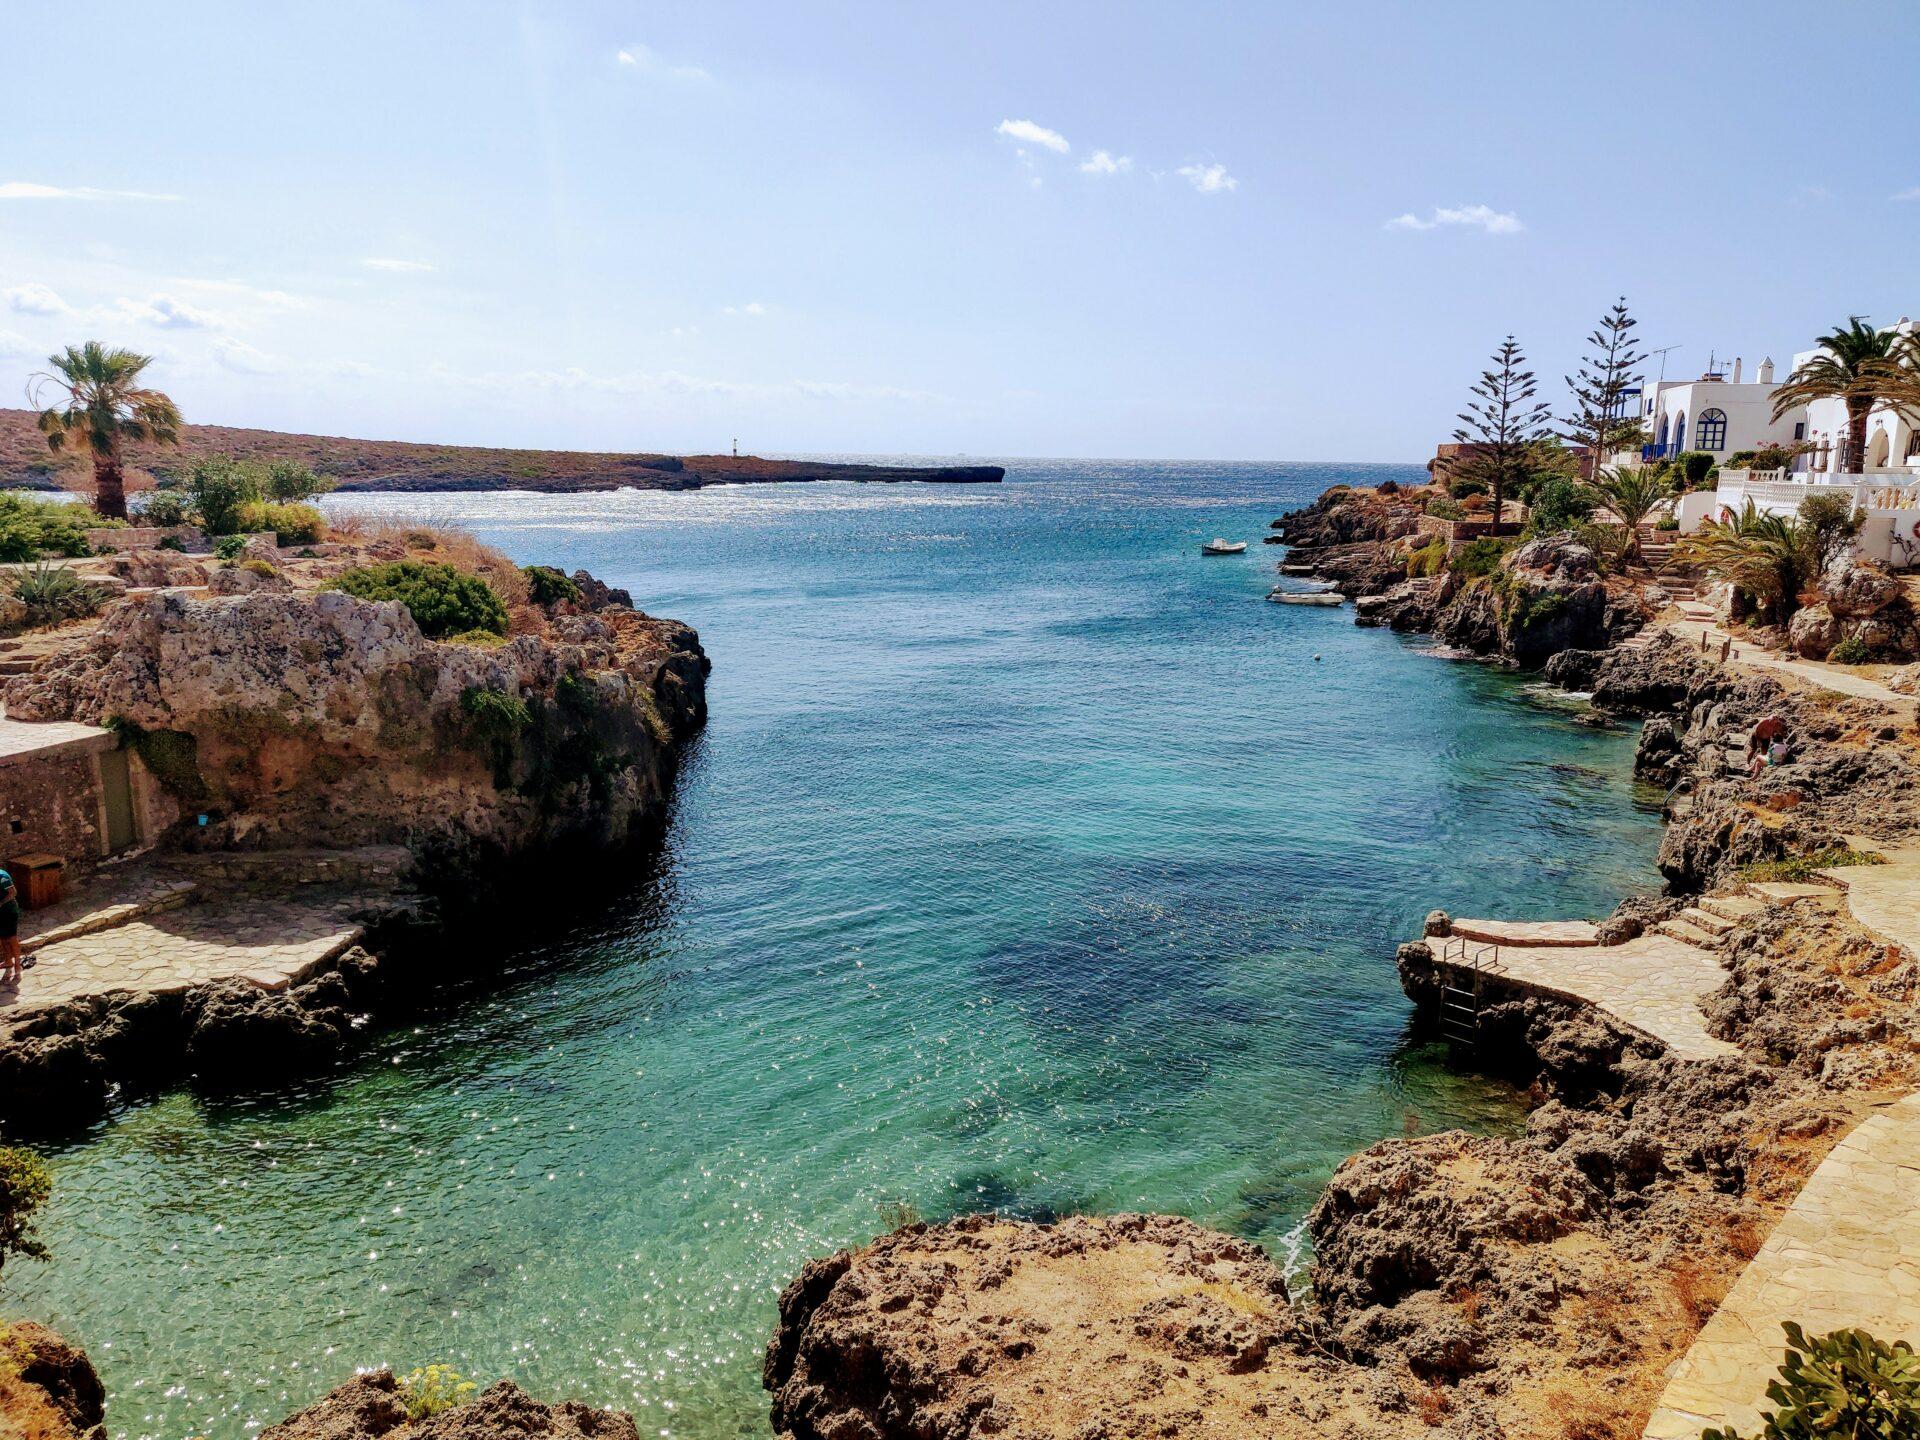 Griekenland - Europa - TravelRebel - reisblog